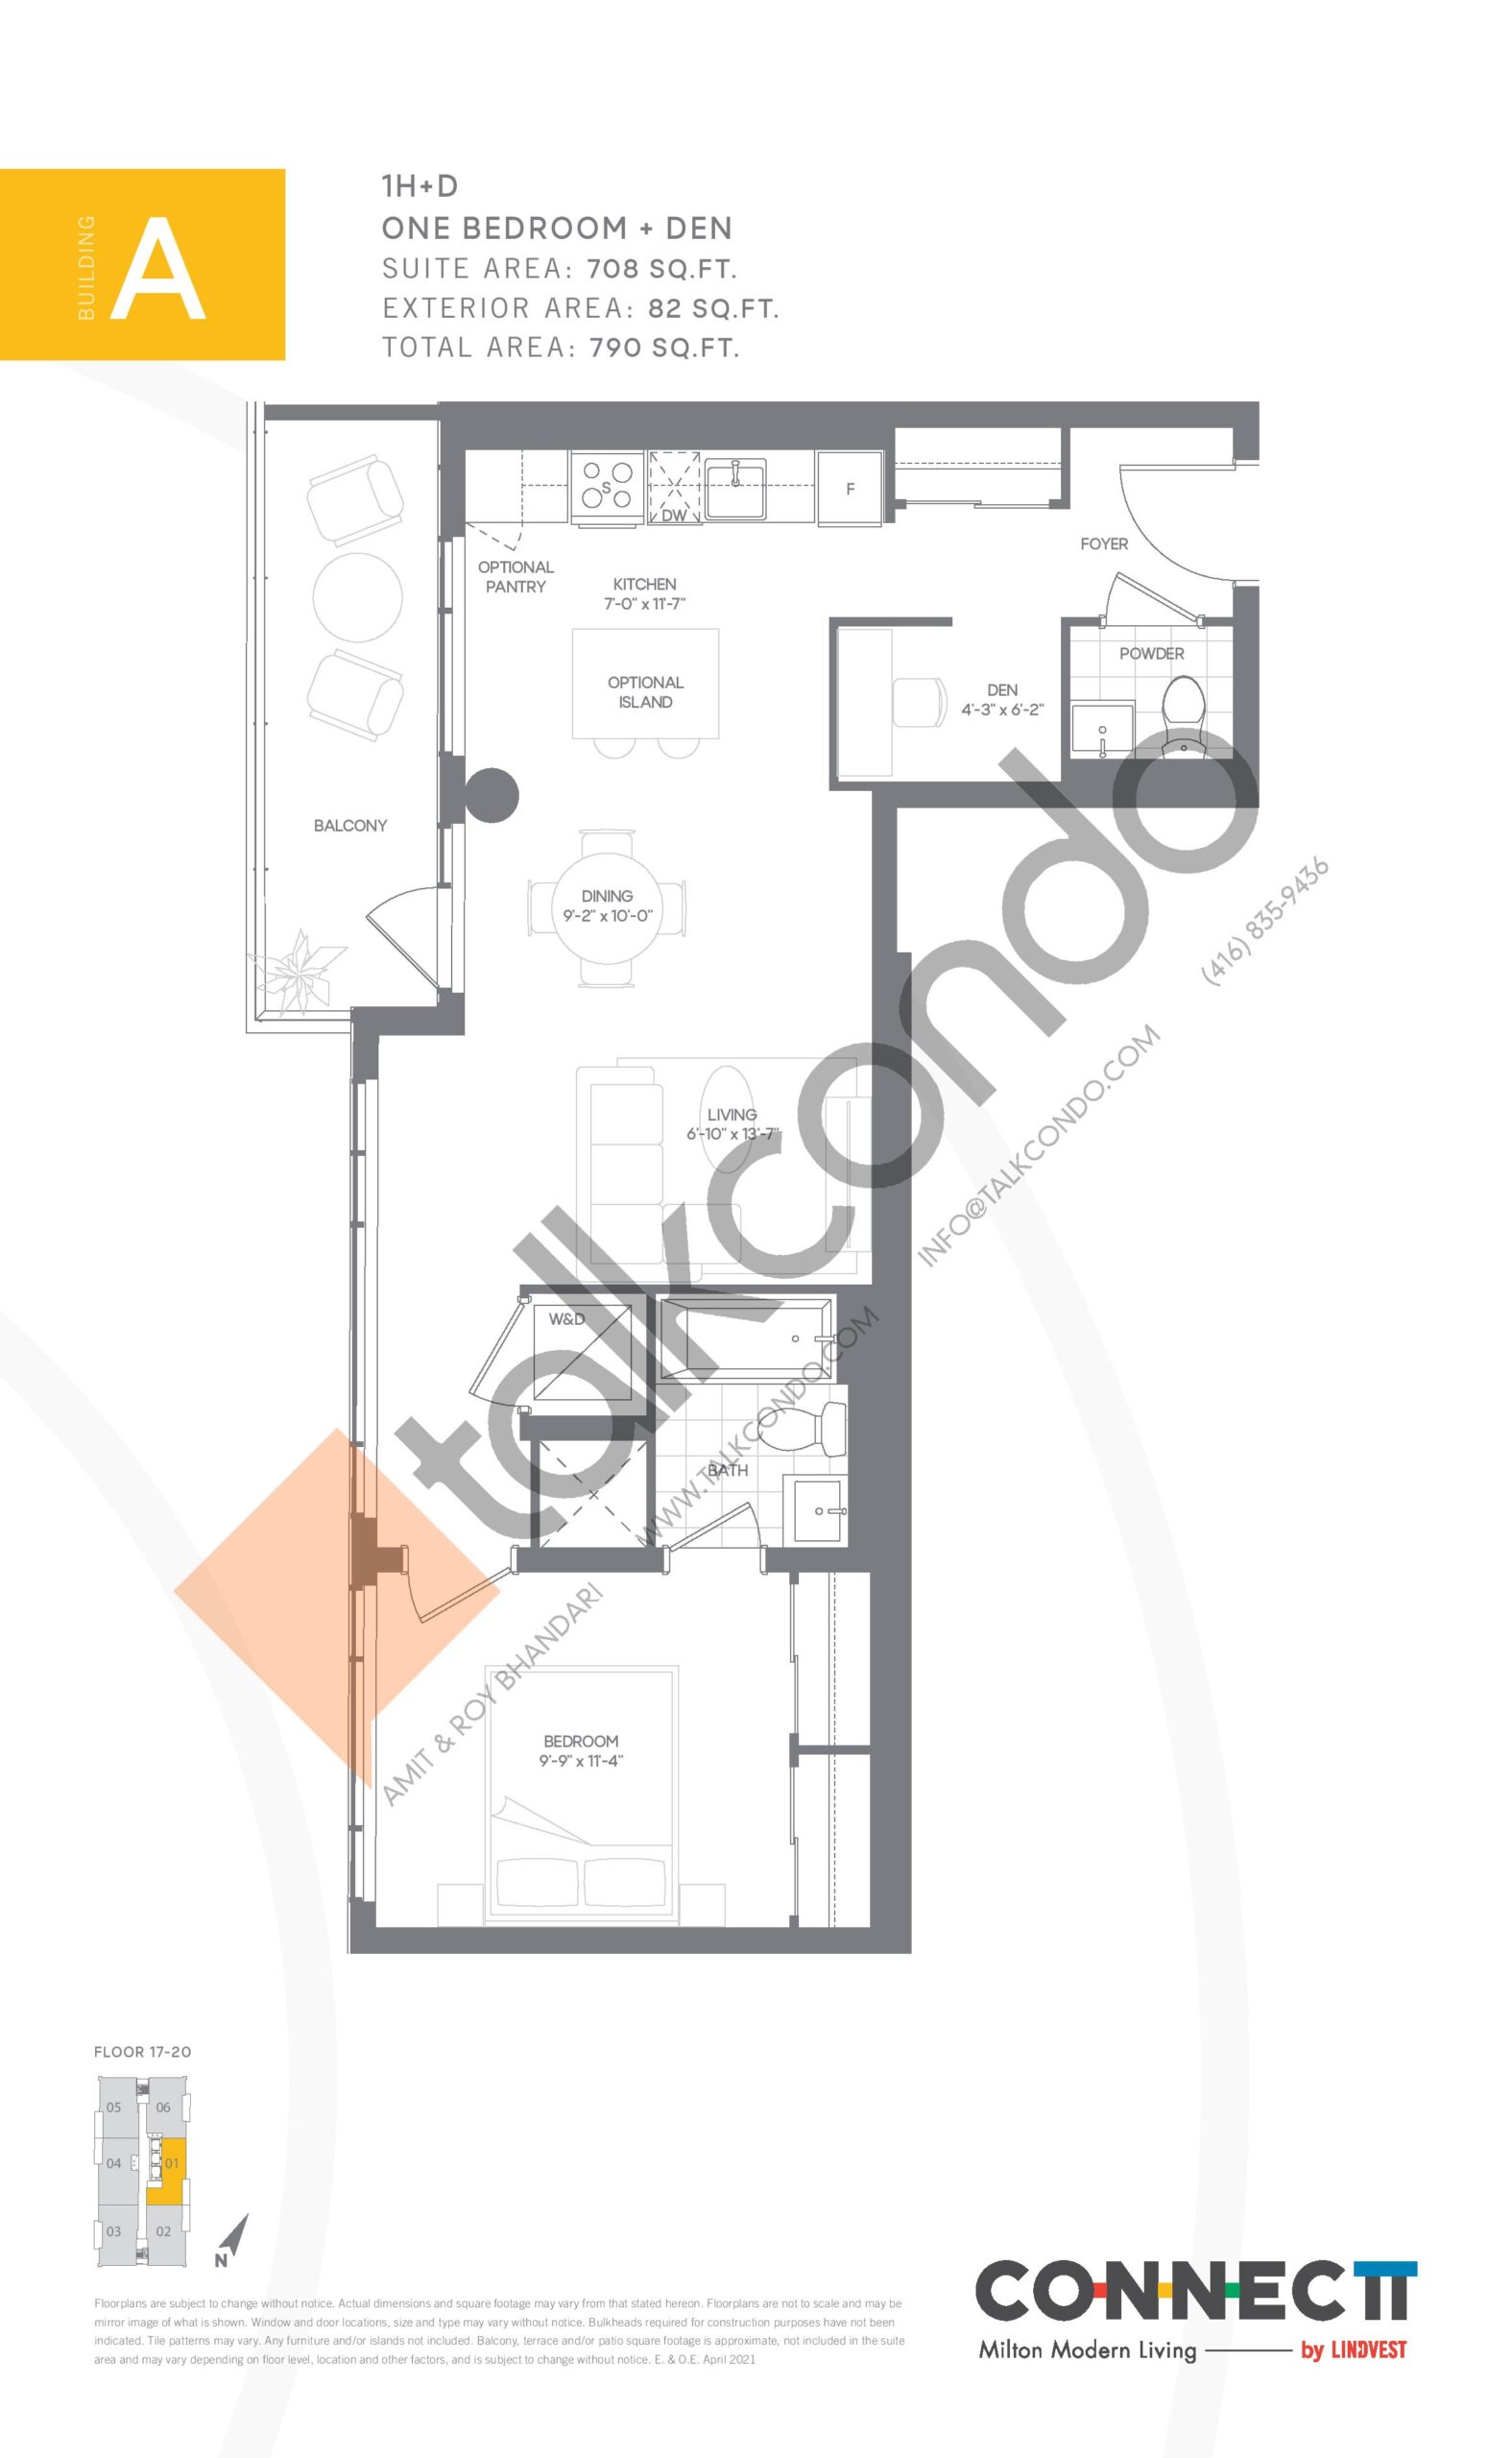 1H+D Floor Plan at Connectt Urban Community Condos - 708 sq.ft